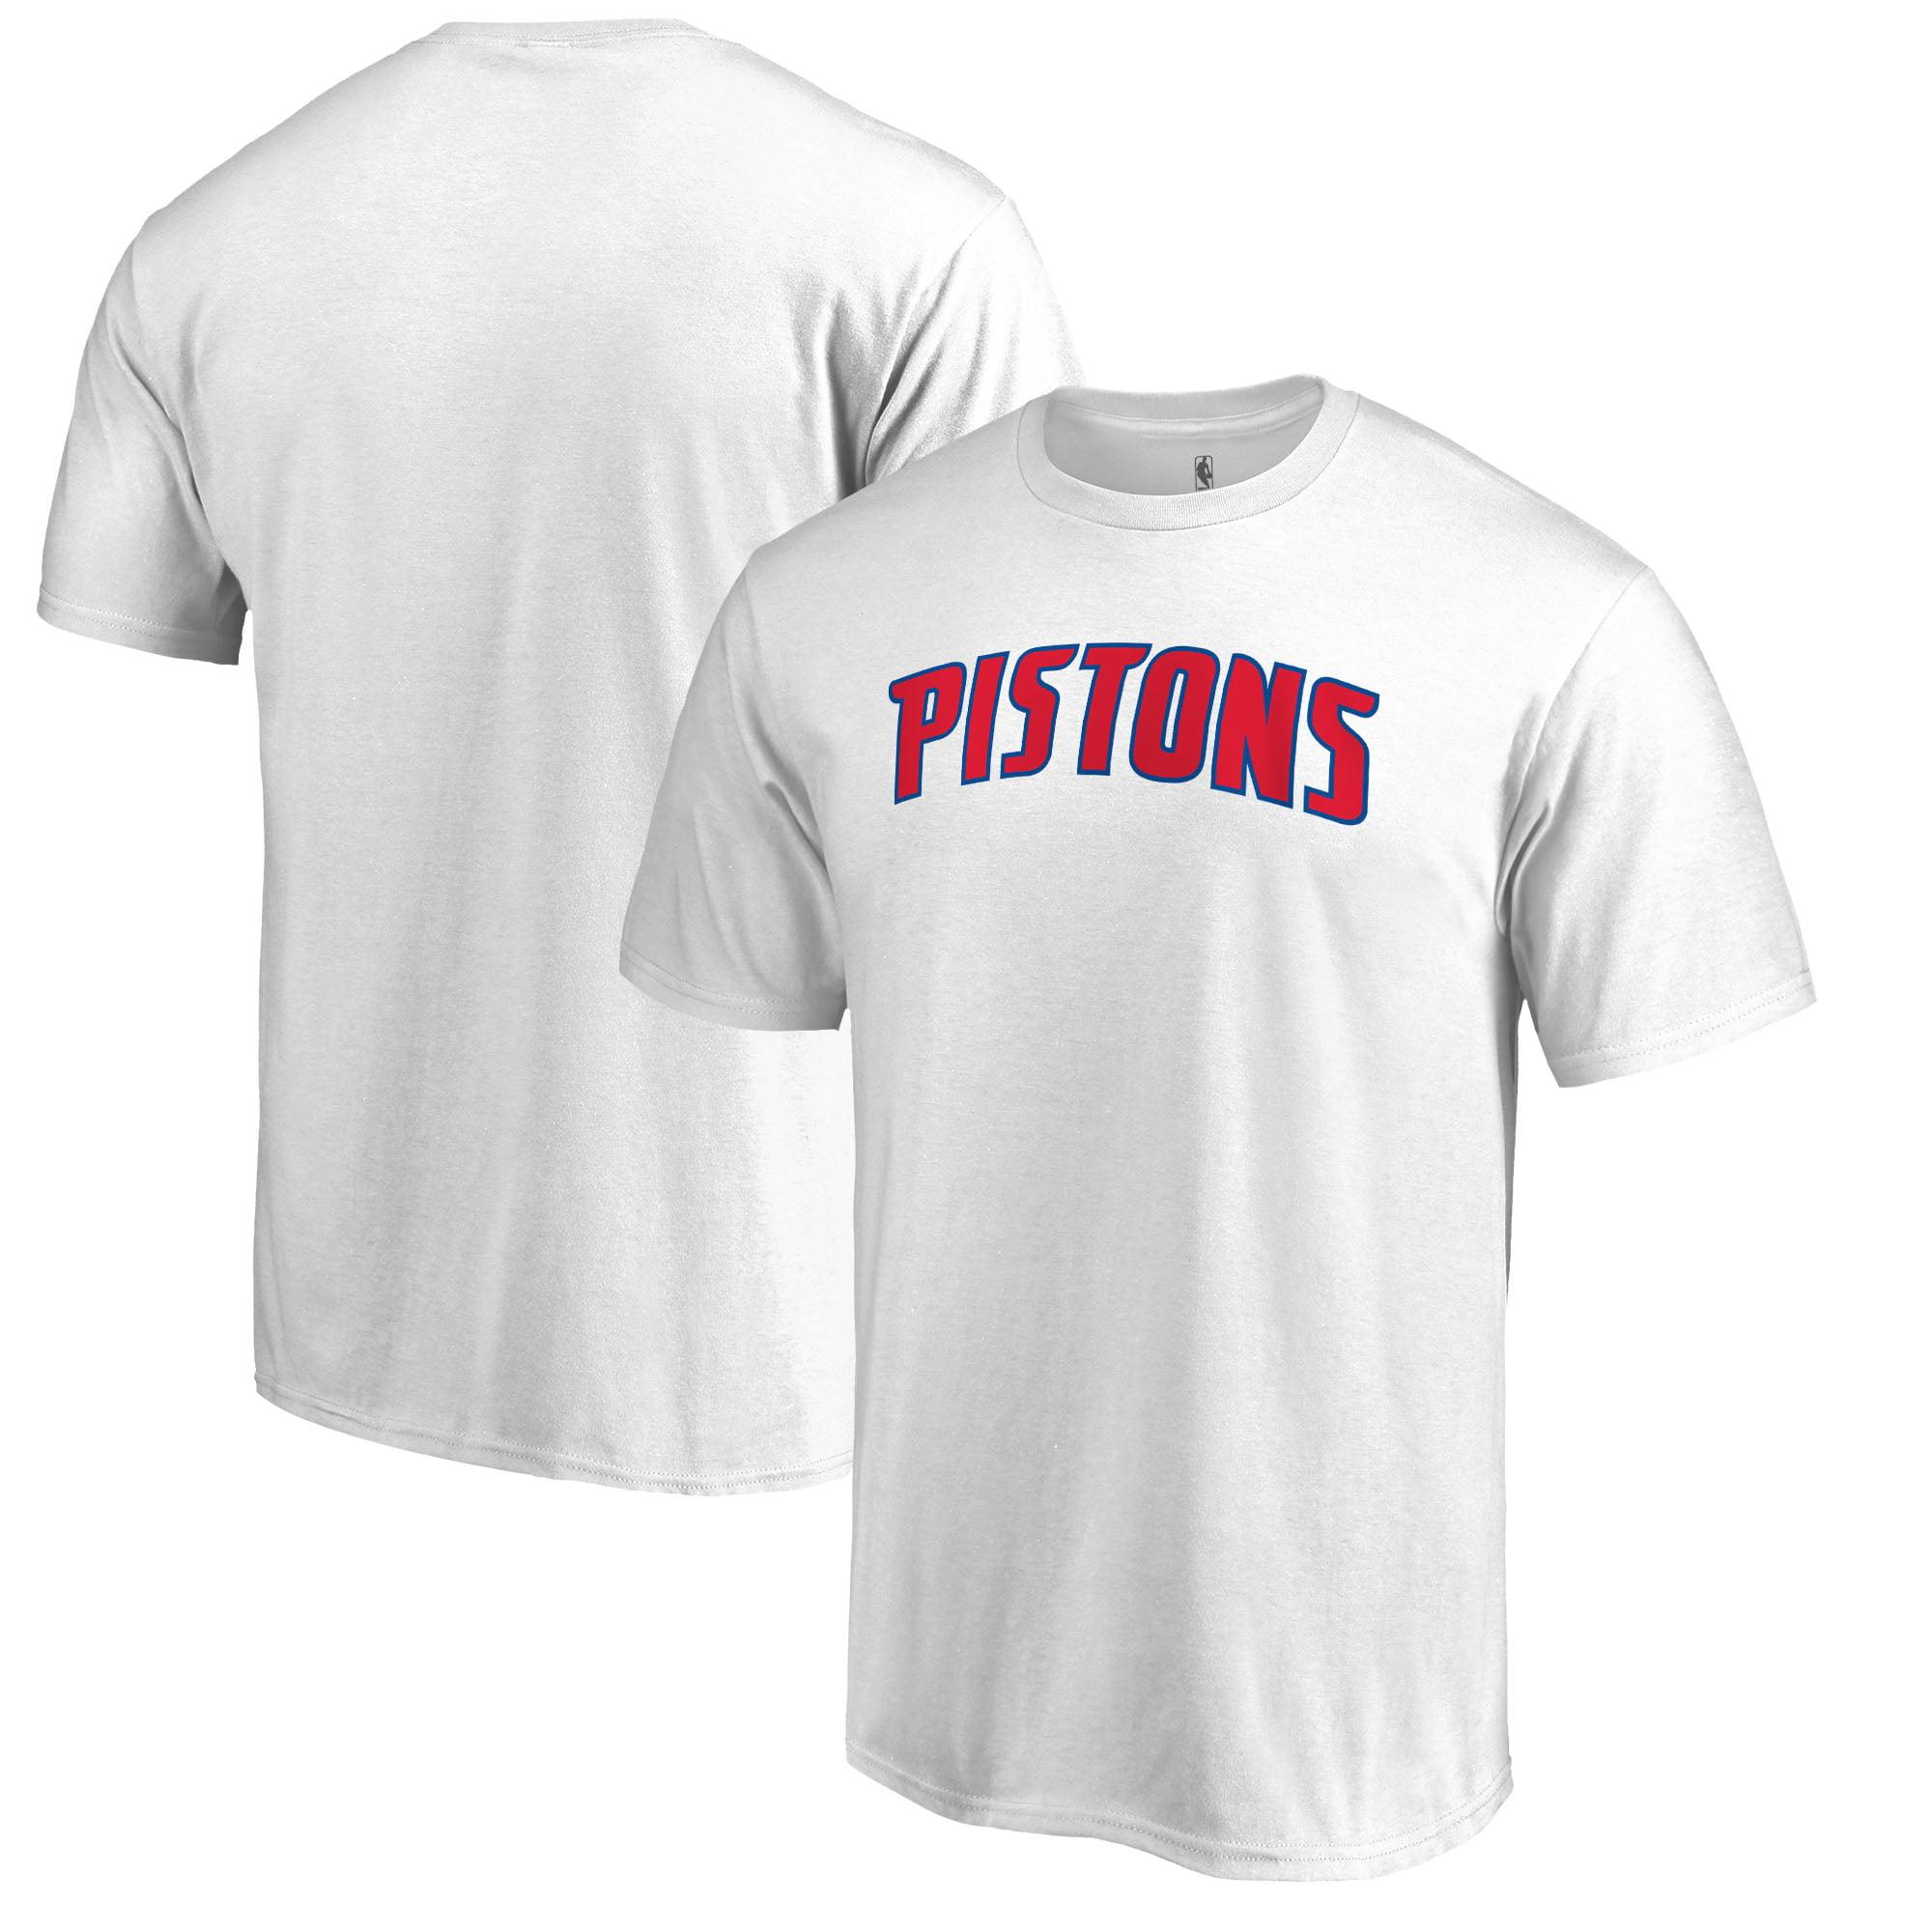 Detroit Pistons Fanatics Branded Primary Wordmark T-Shirt - White